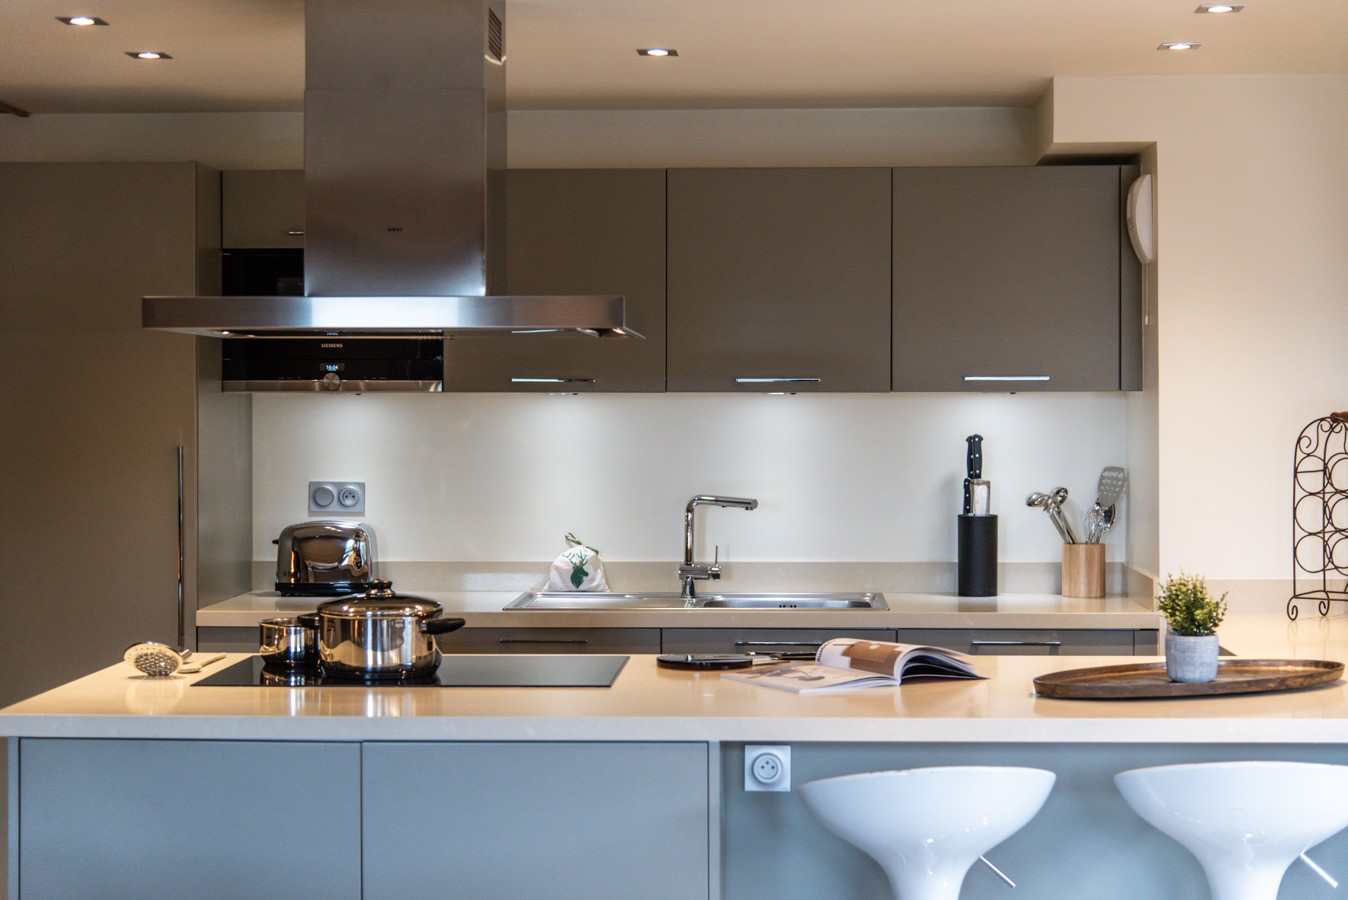 Courchevel 1650 Location Appartement Luxe Amethyste Cuisine 2